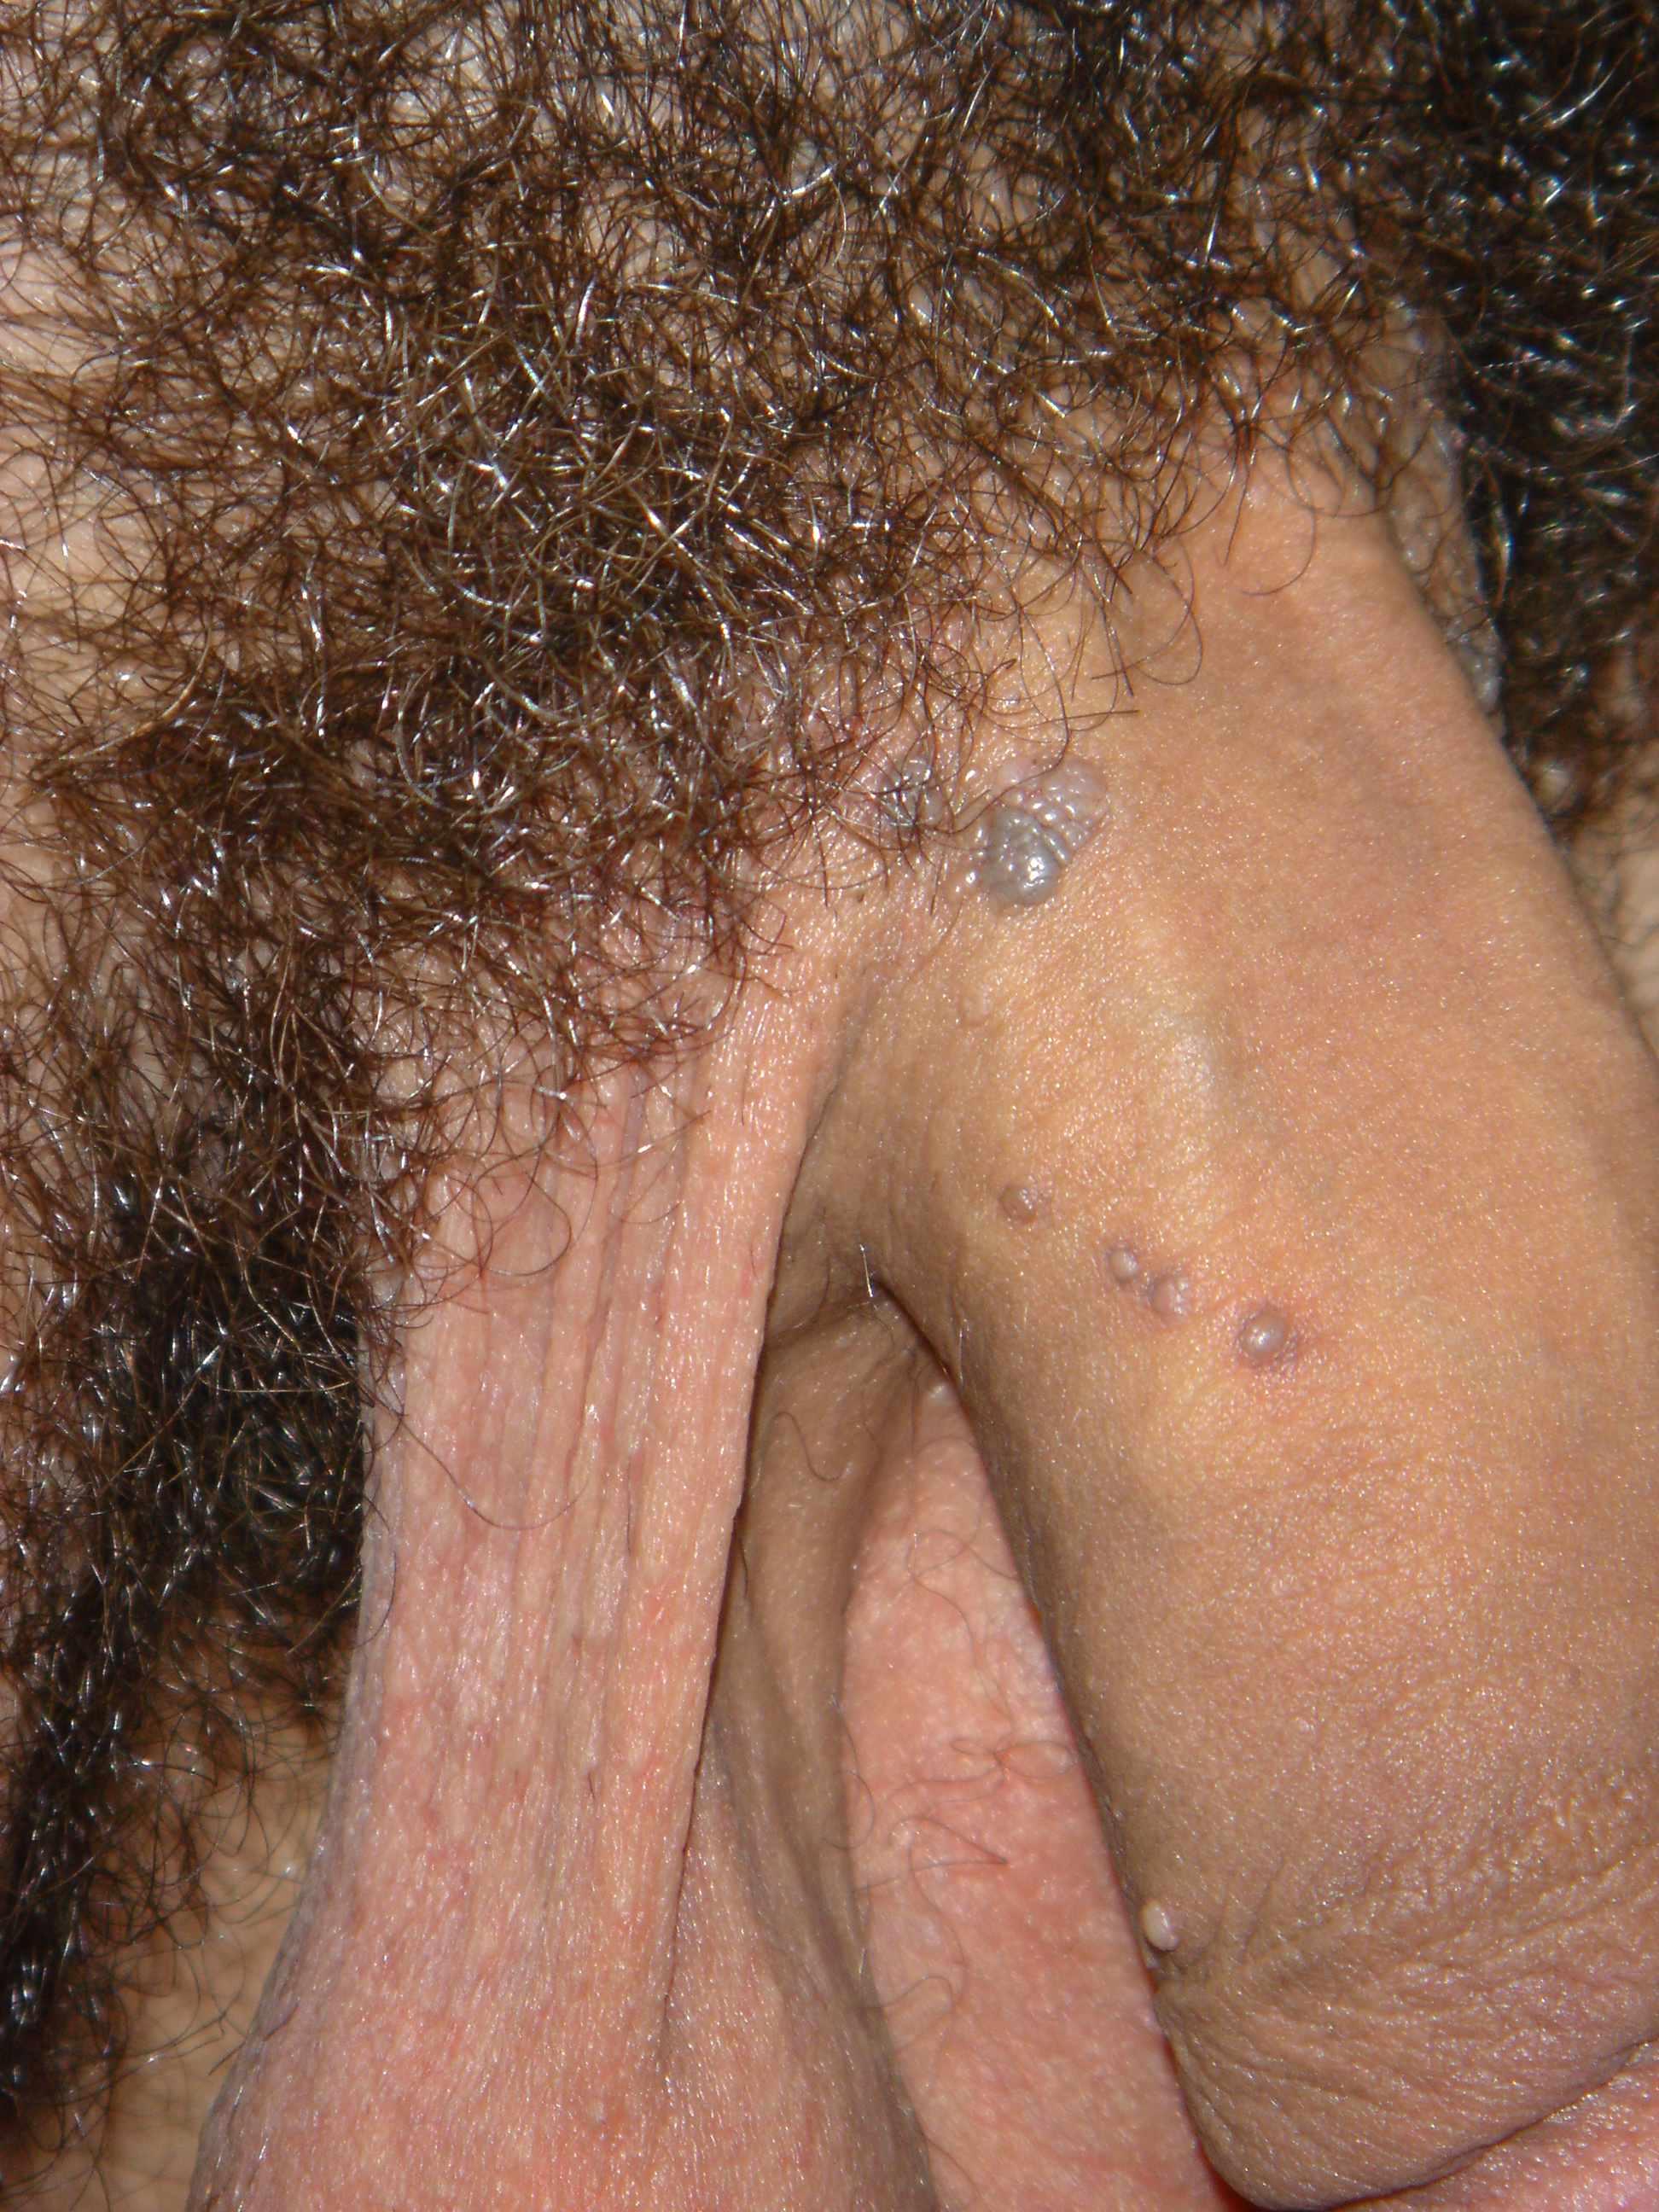 best of Due ot masturbation Genital warts